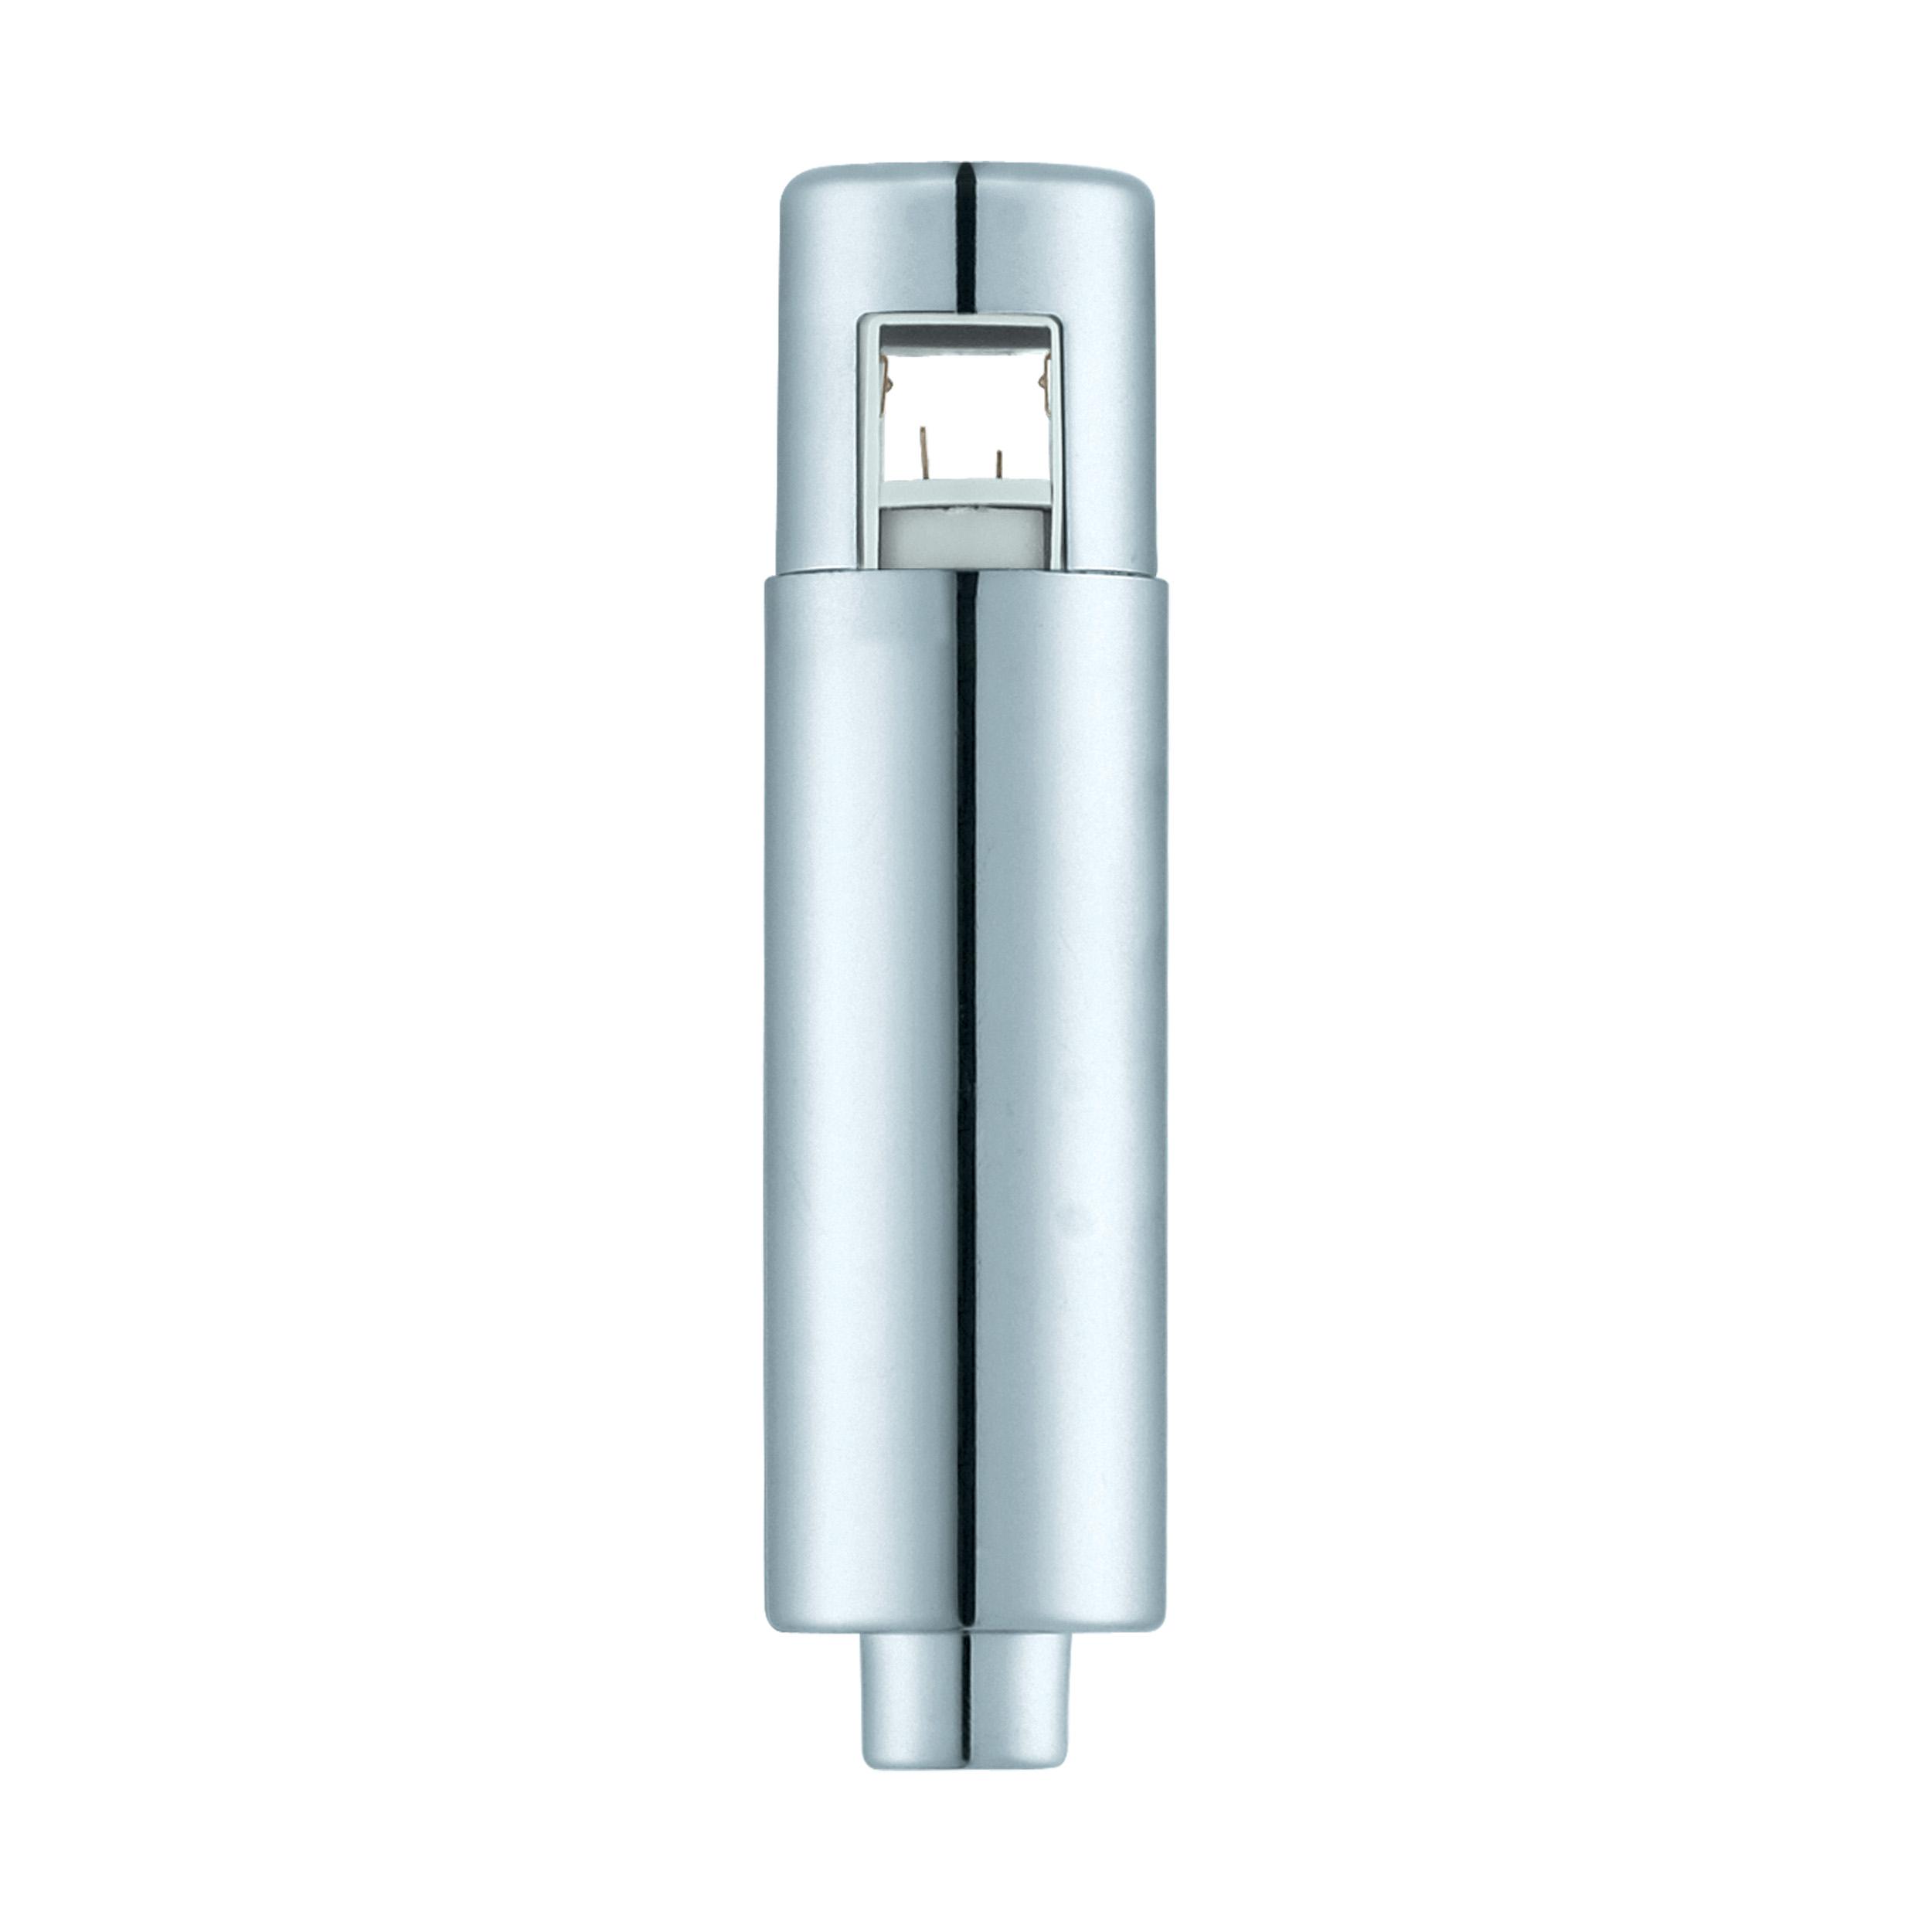 1 Stk Adapter chrom für HL Villanova 1 chrom IP20 LI61493---